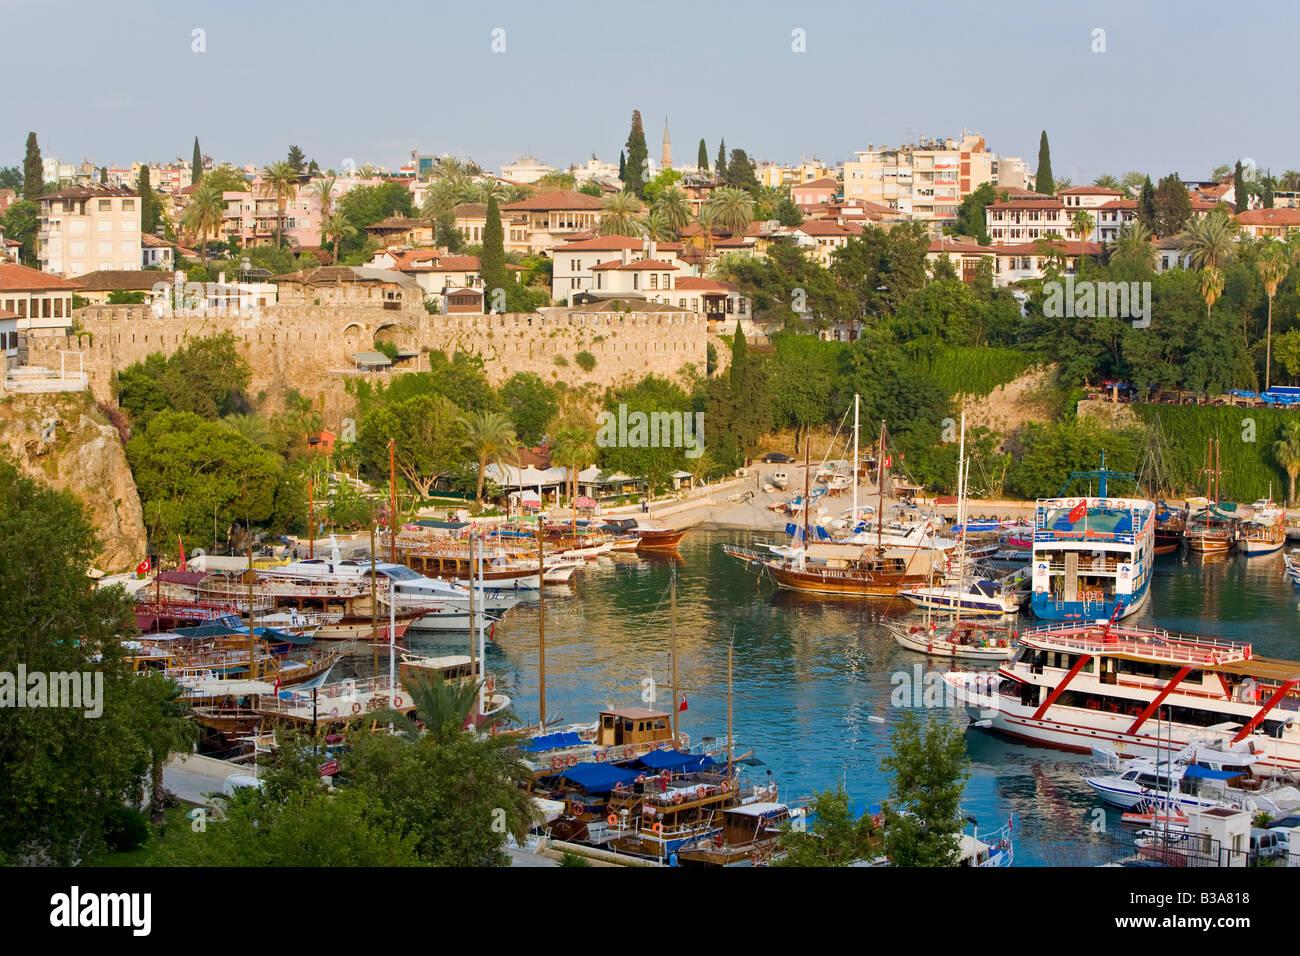 Marina and Roman Harbour, Kaleici, Antalya, Turkey - Stock Image